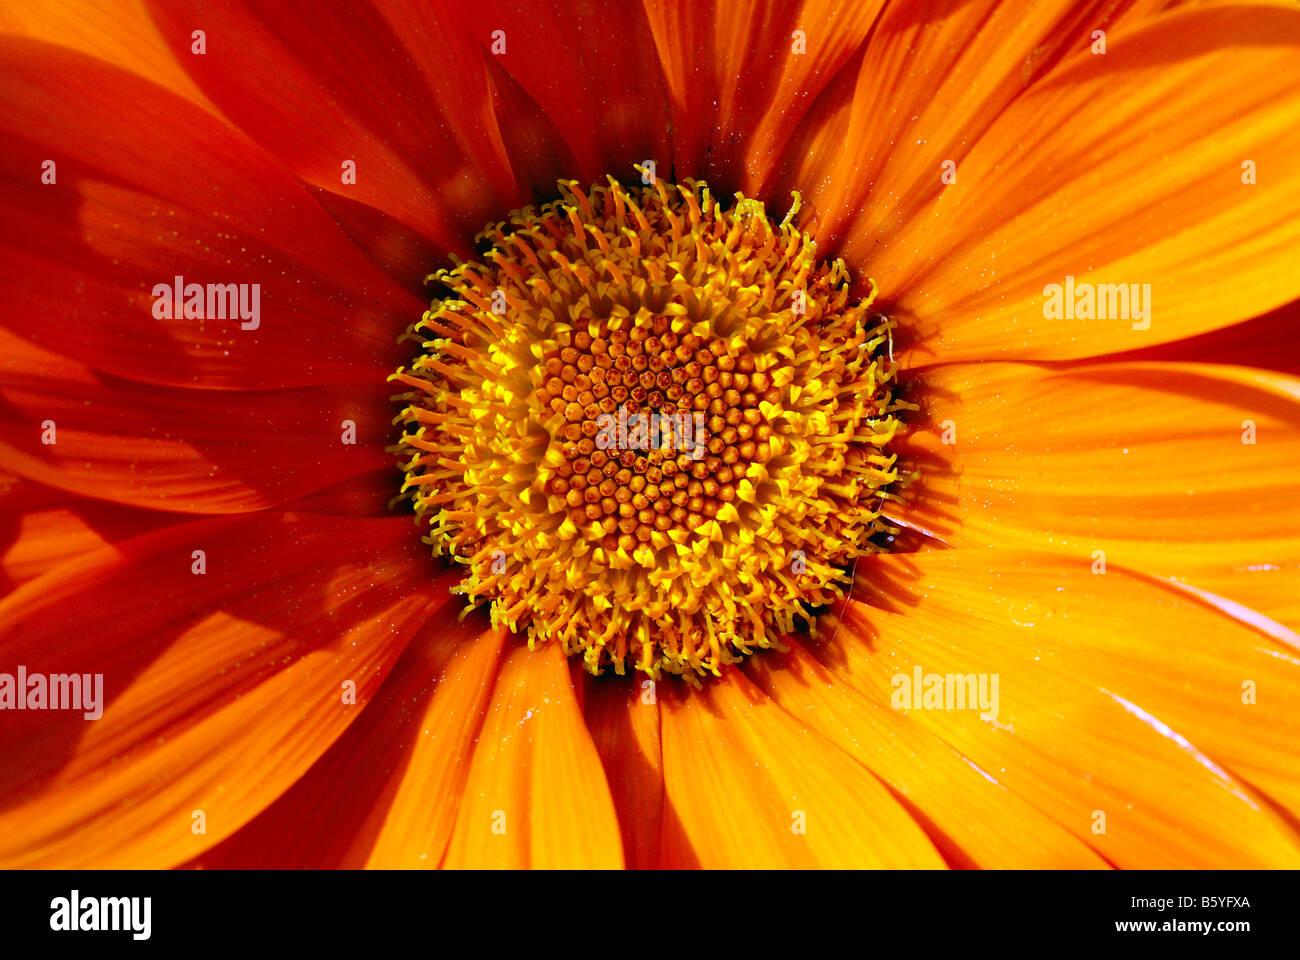 corolla of flower - Stock Image